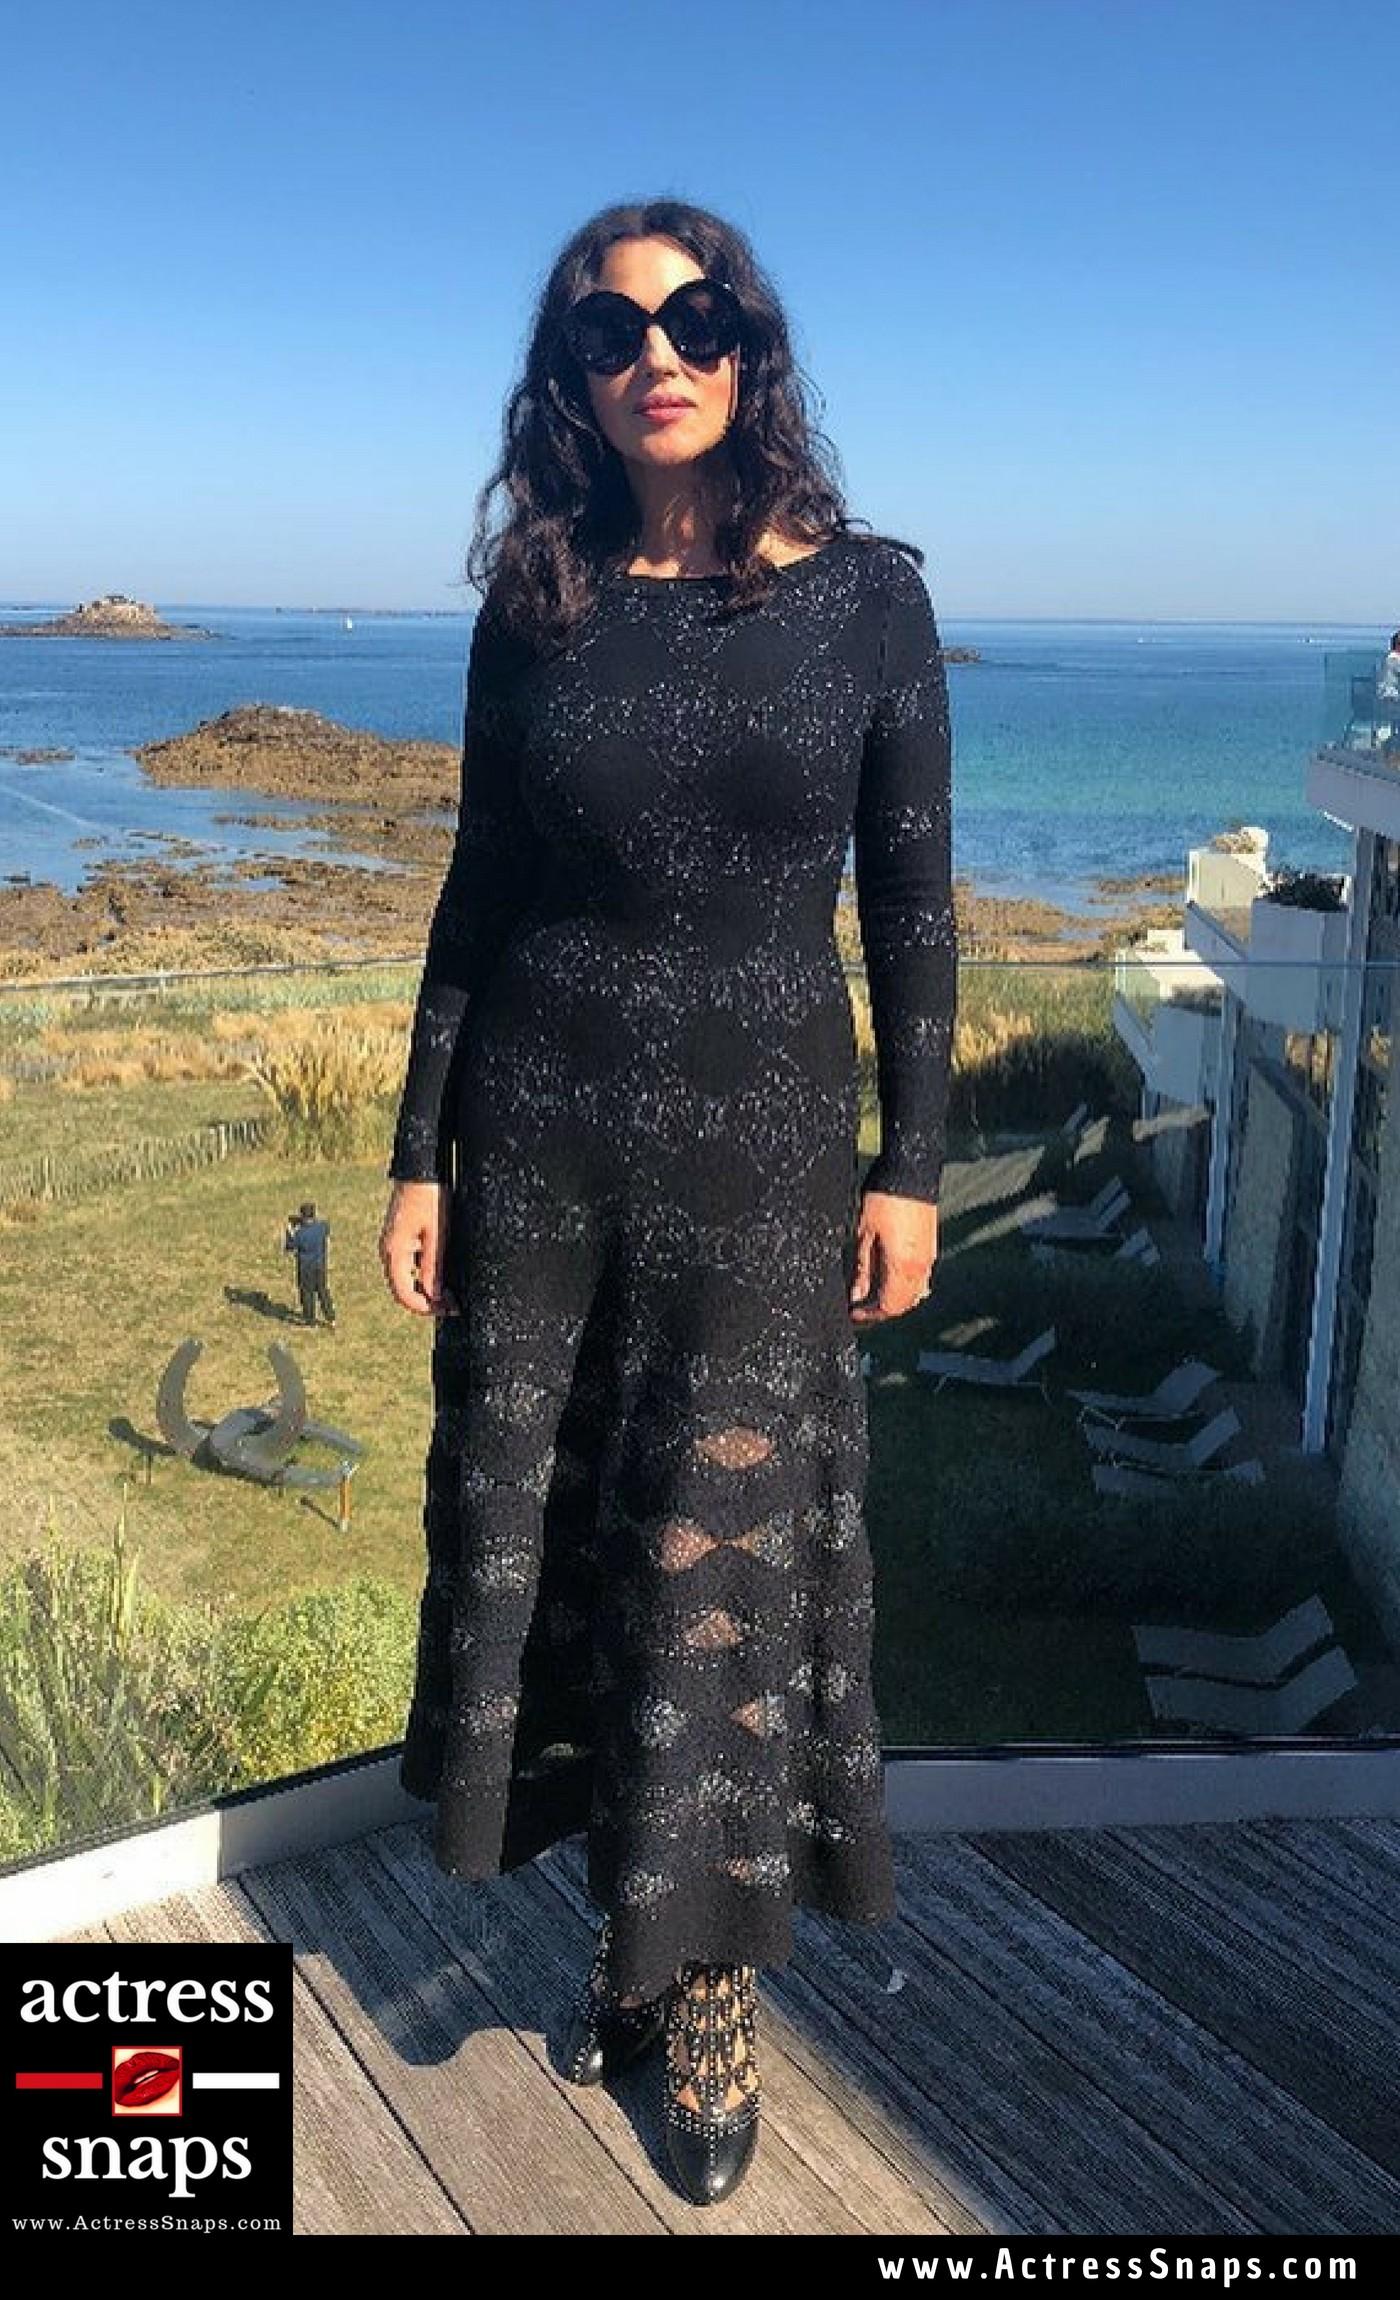 Monica Bellucci at The Dinard Film Festival Pictures #monicabellucci #bellucci